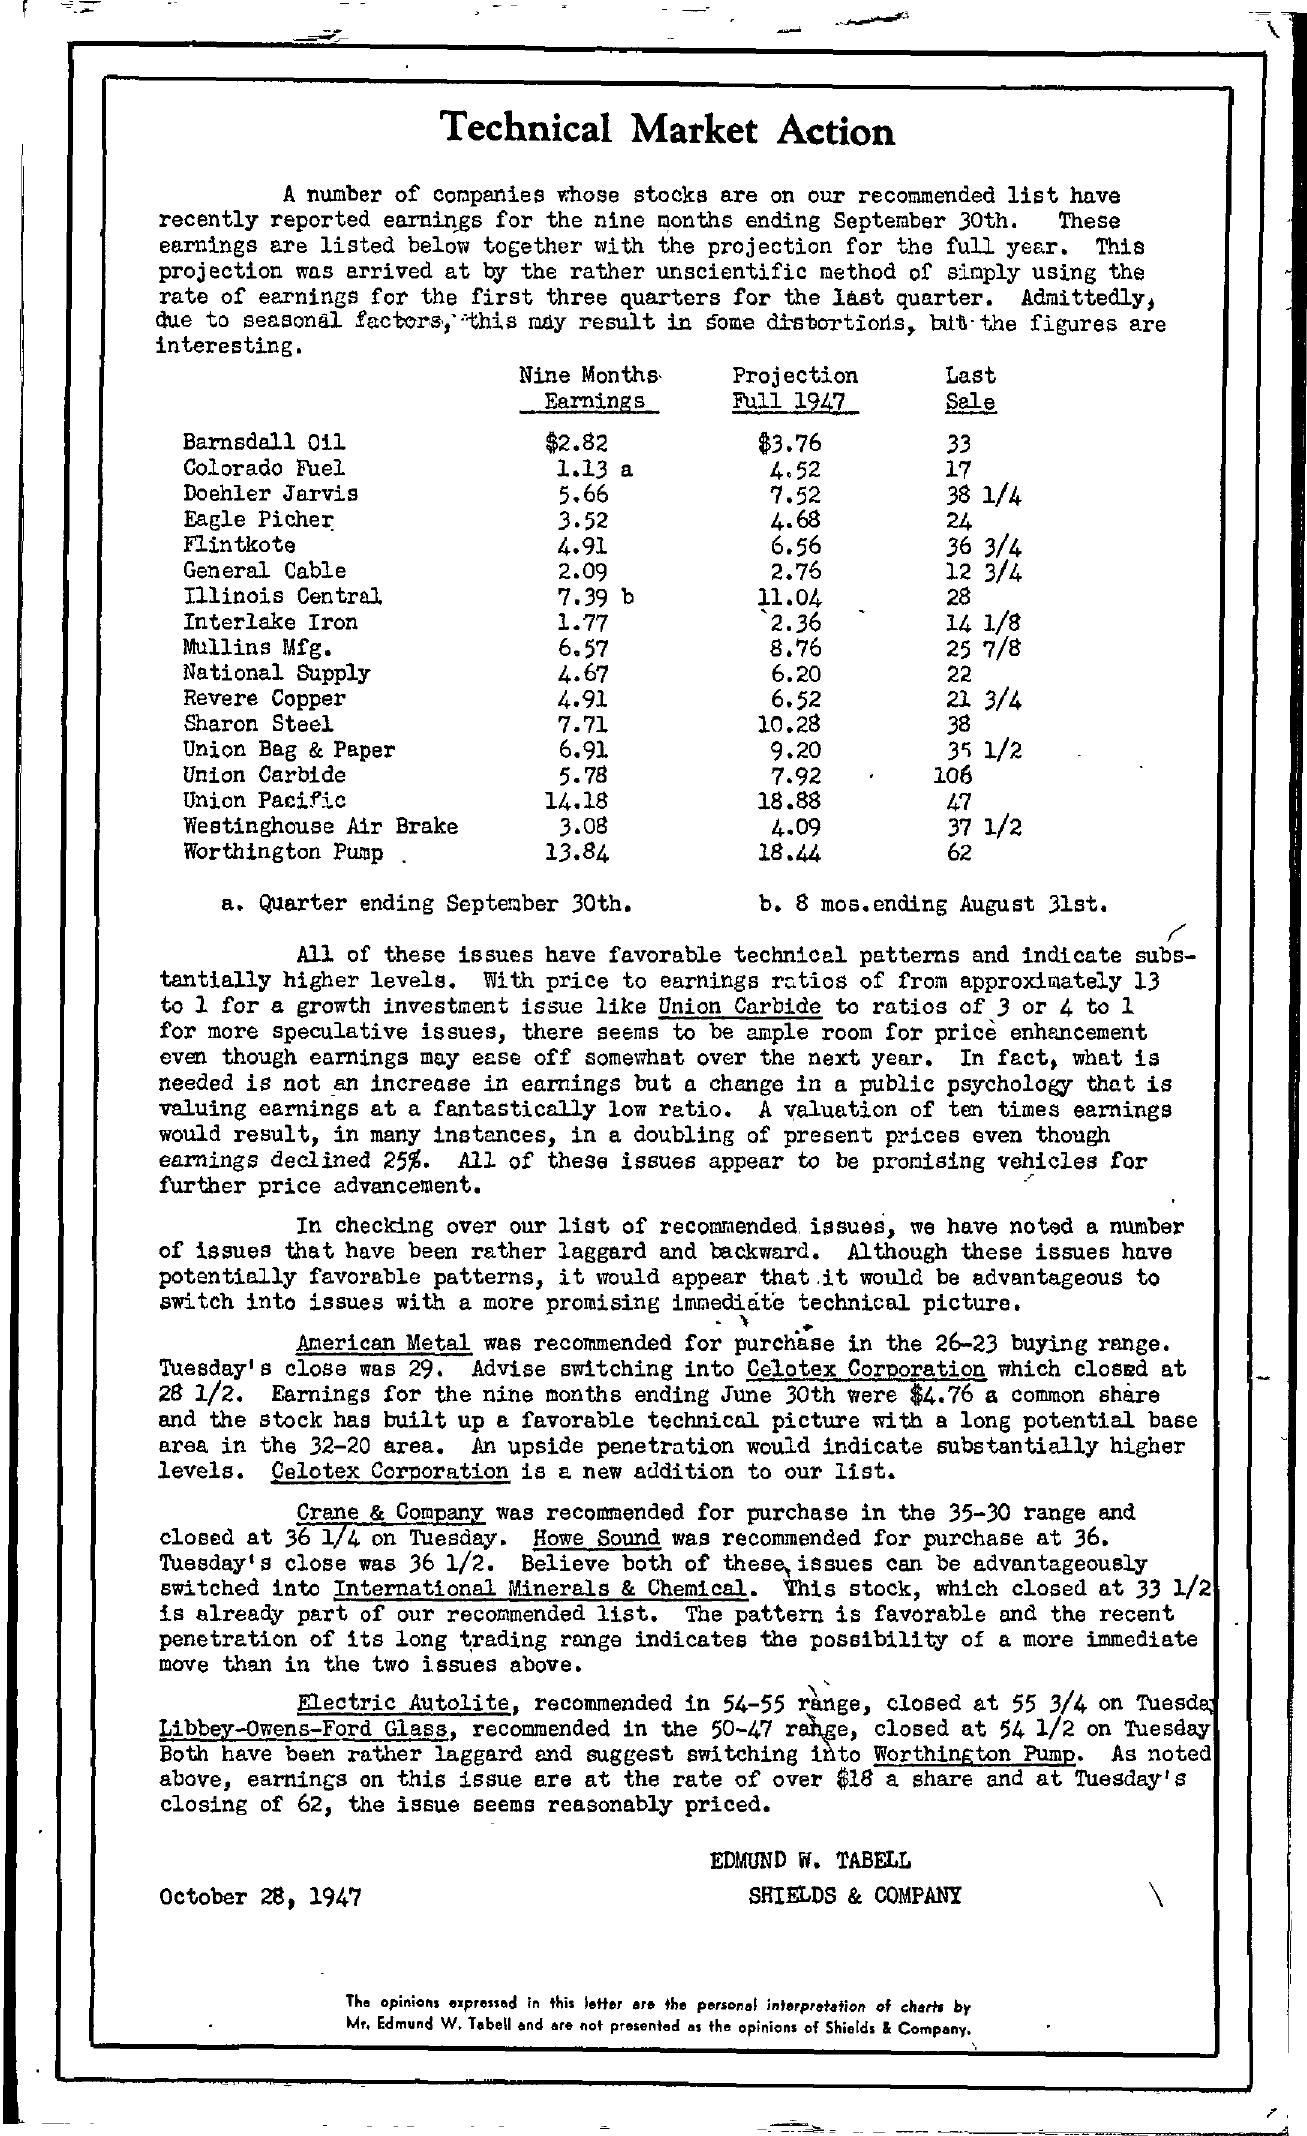 Tabell's Market Letter - October 28, 1947